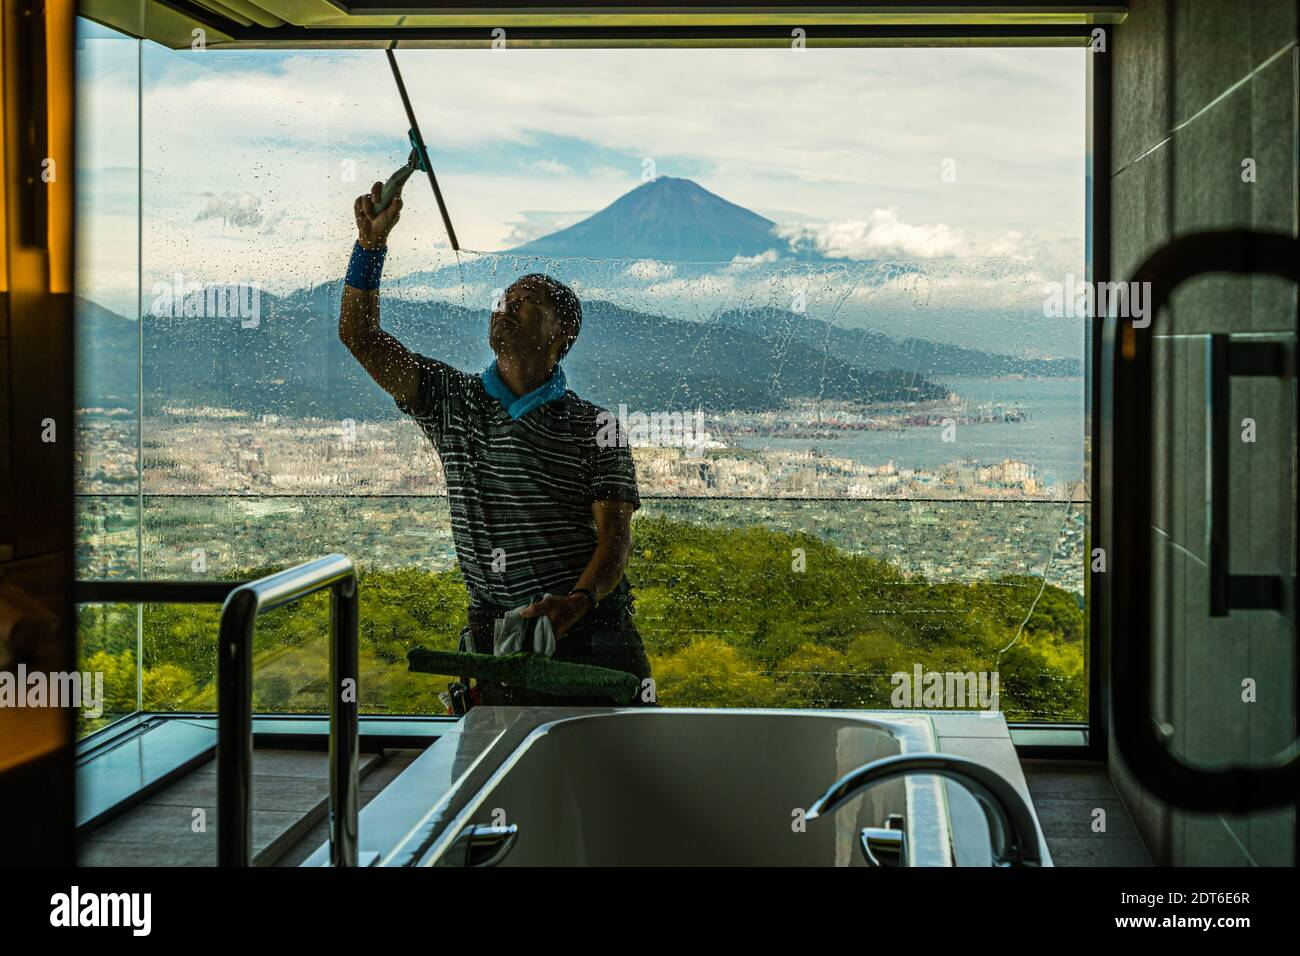 Fensterputzer des Nippondaira Hotels, Shizuoka, Japan mit Blick auf den Fuji Stockfoto